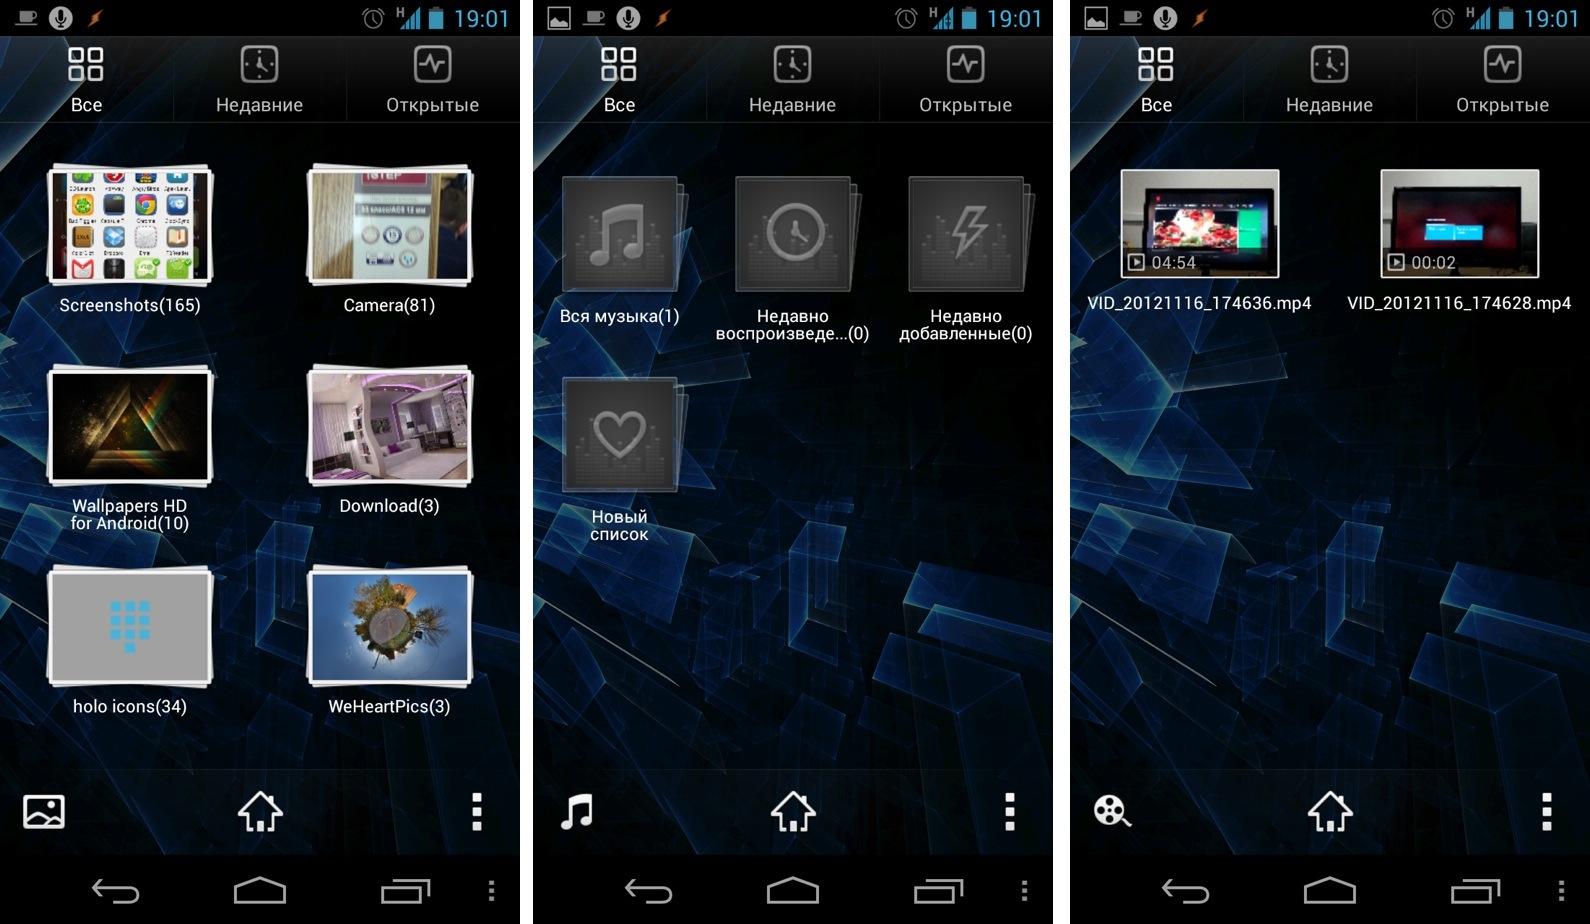 Multimedia content view in GO Launcher EX